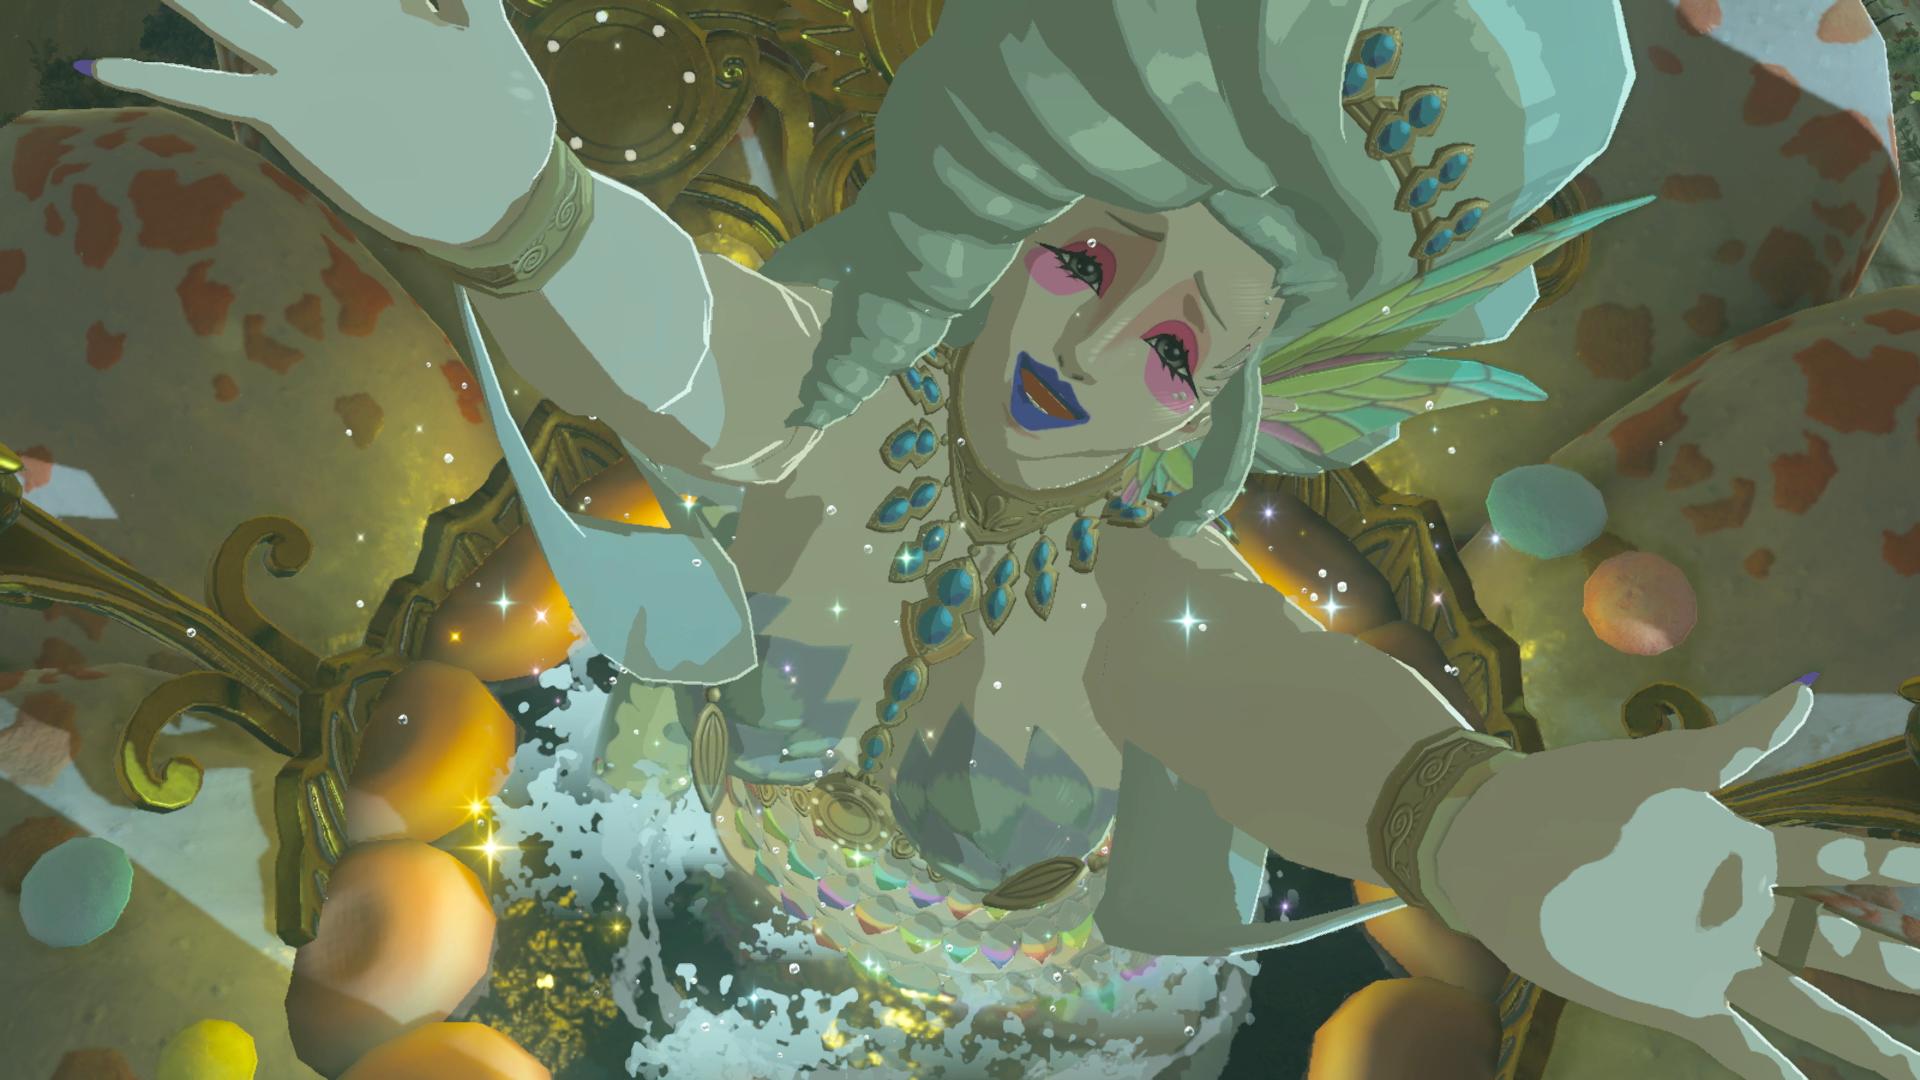 The Legend of Zelda: Breath of the Wild image 38